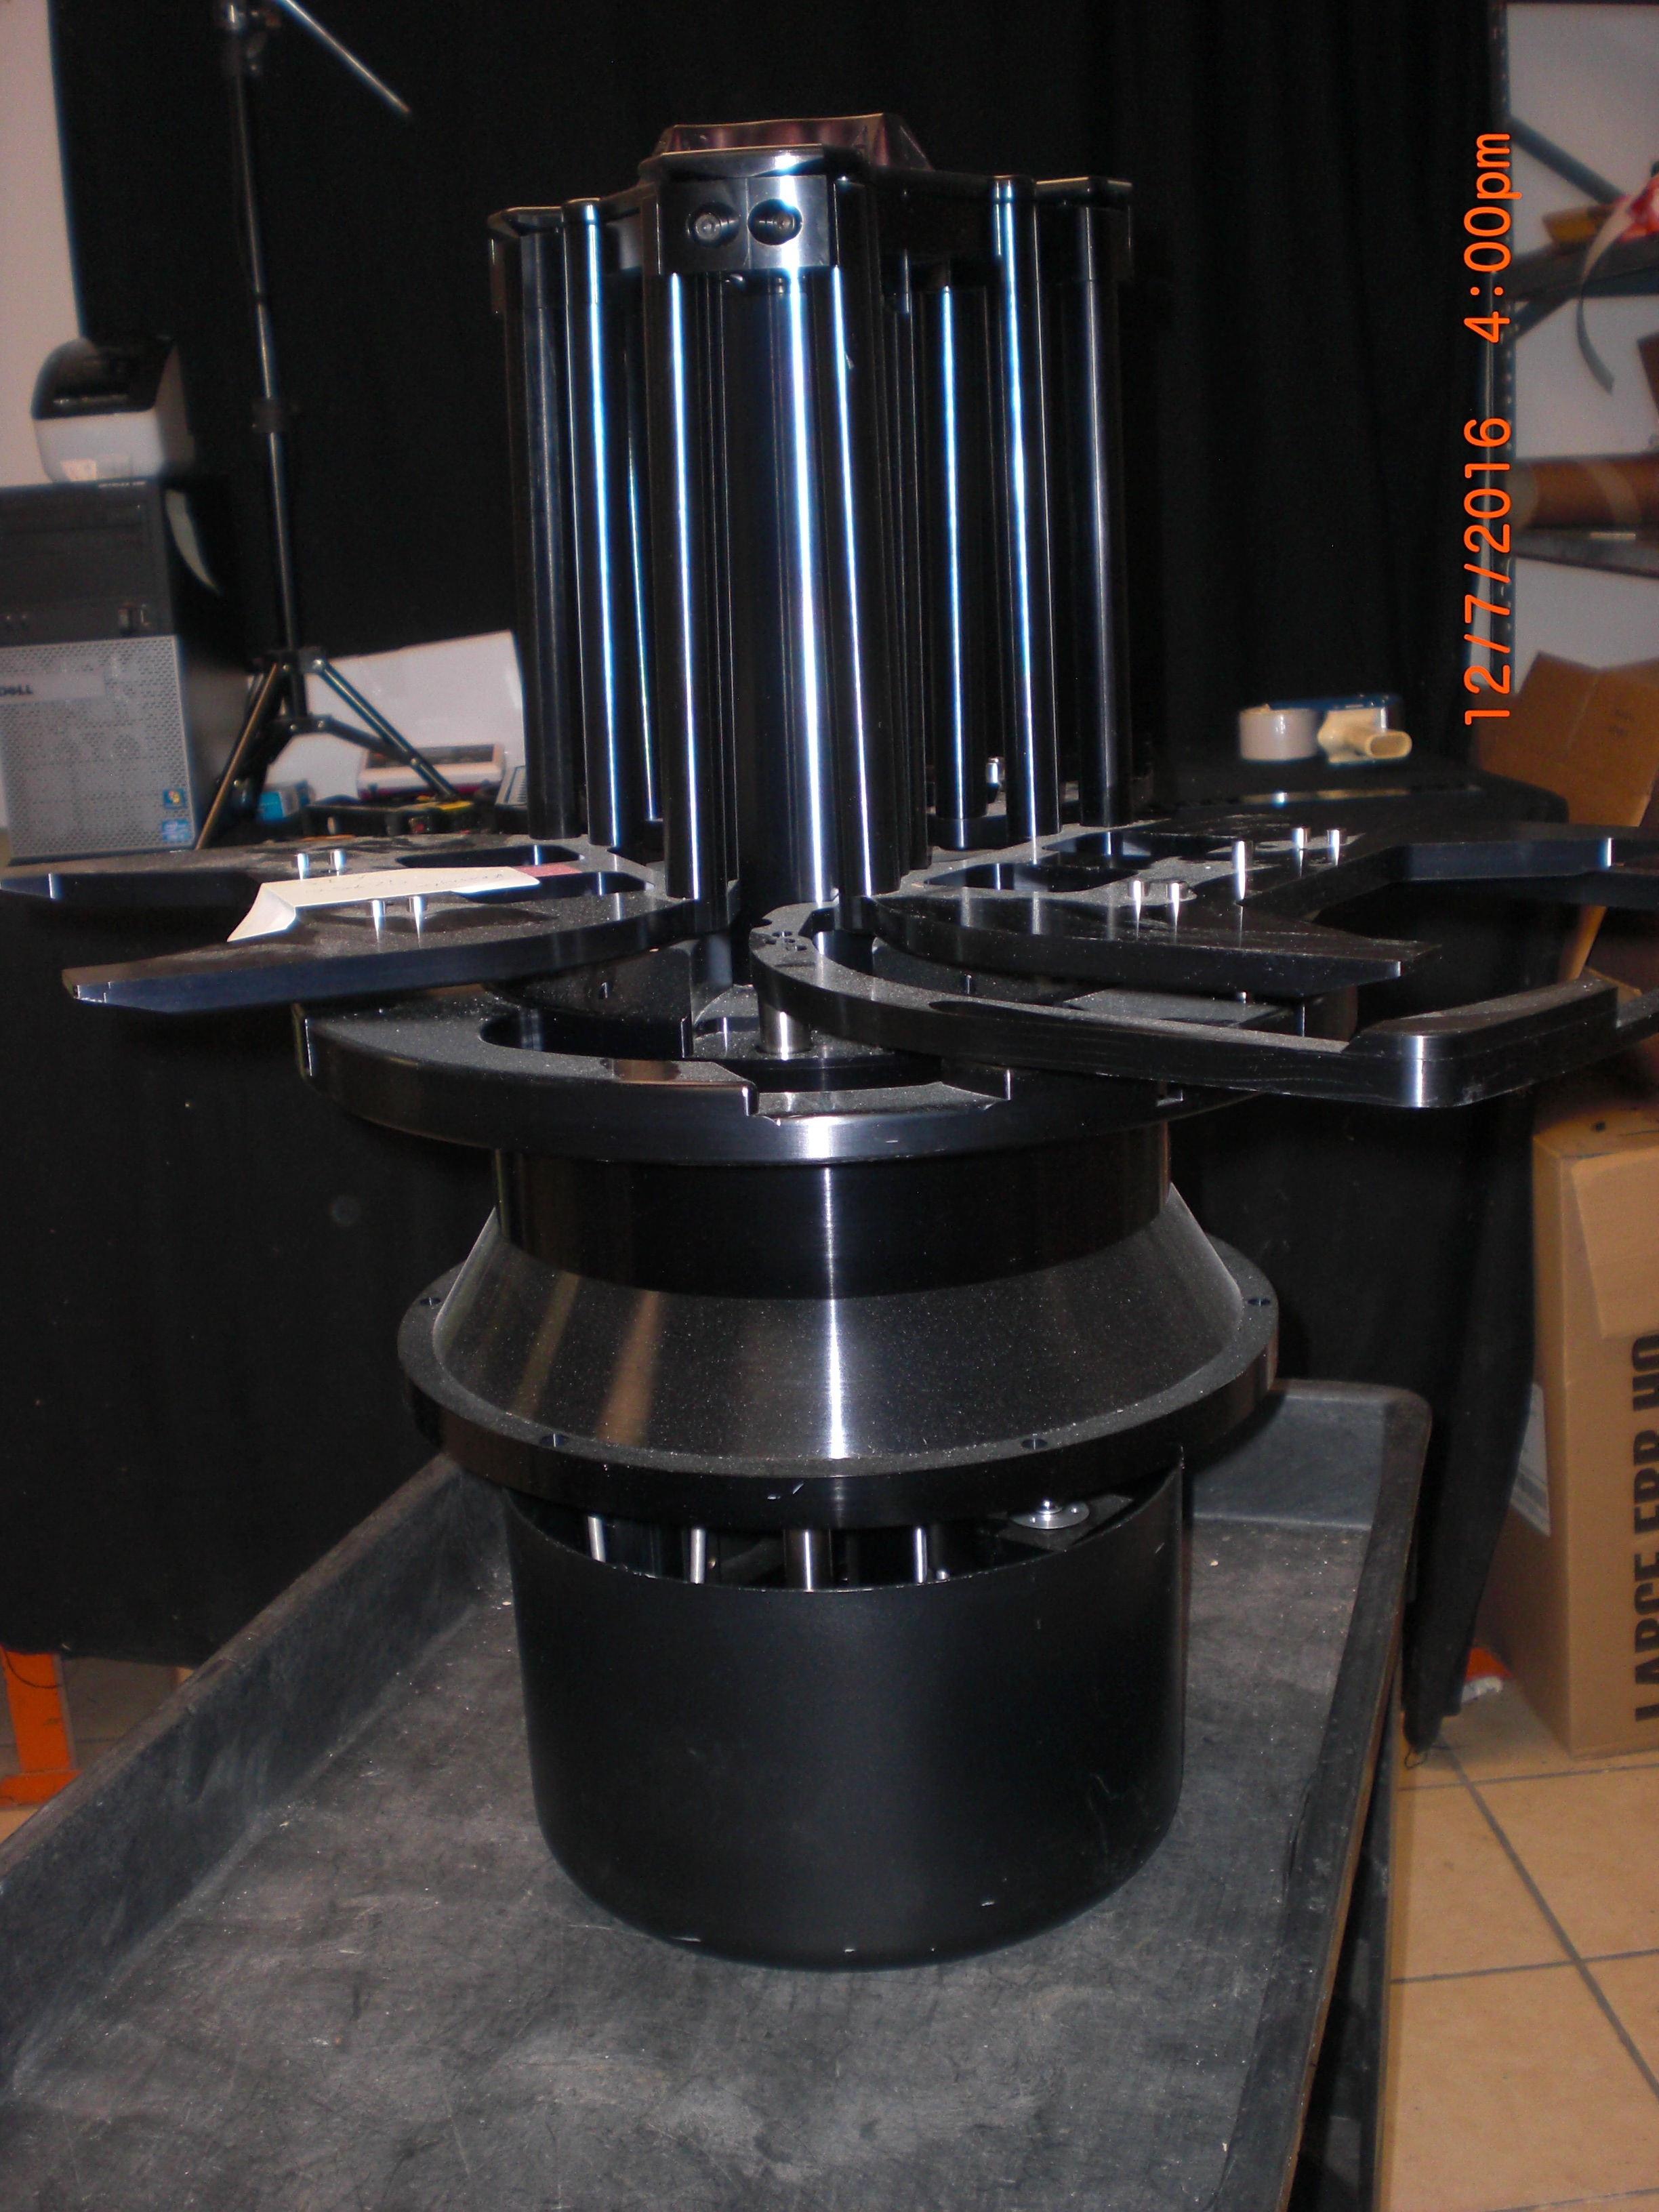 Robot KENSINGTON L93968 Carousel-2 Wafer Handling